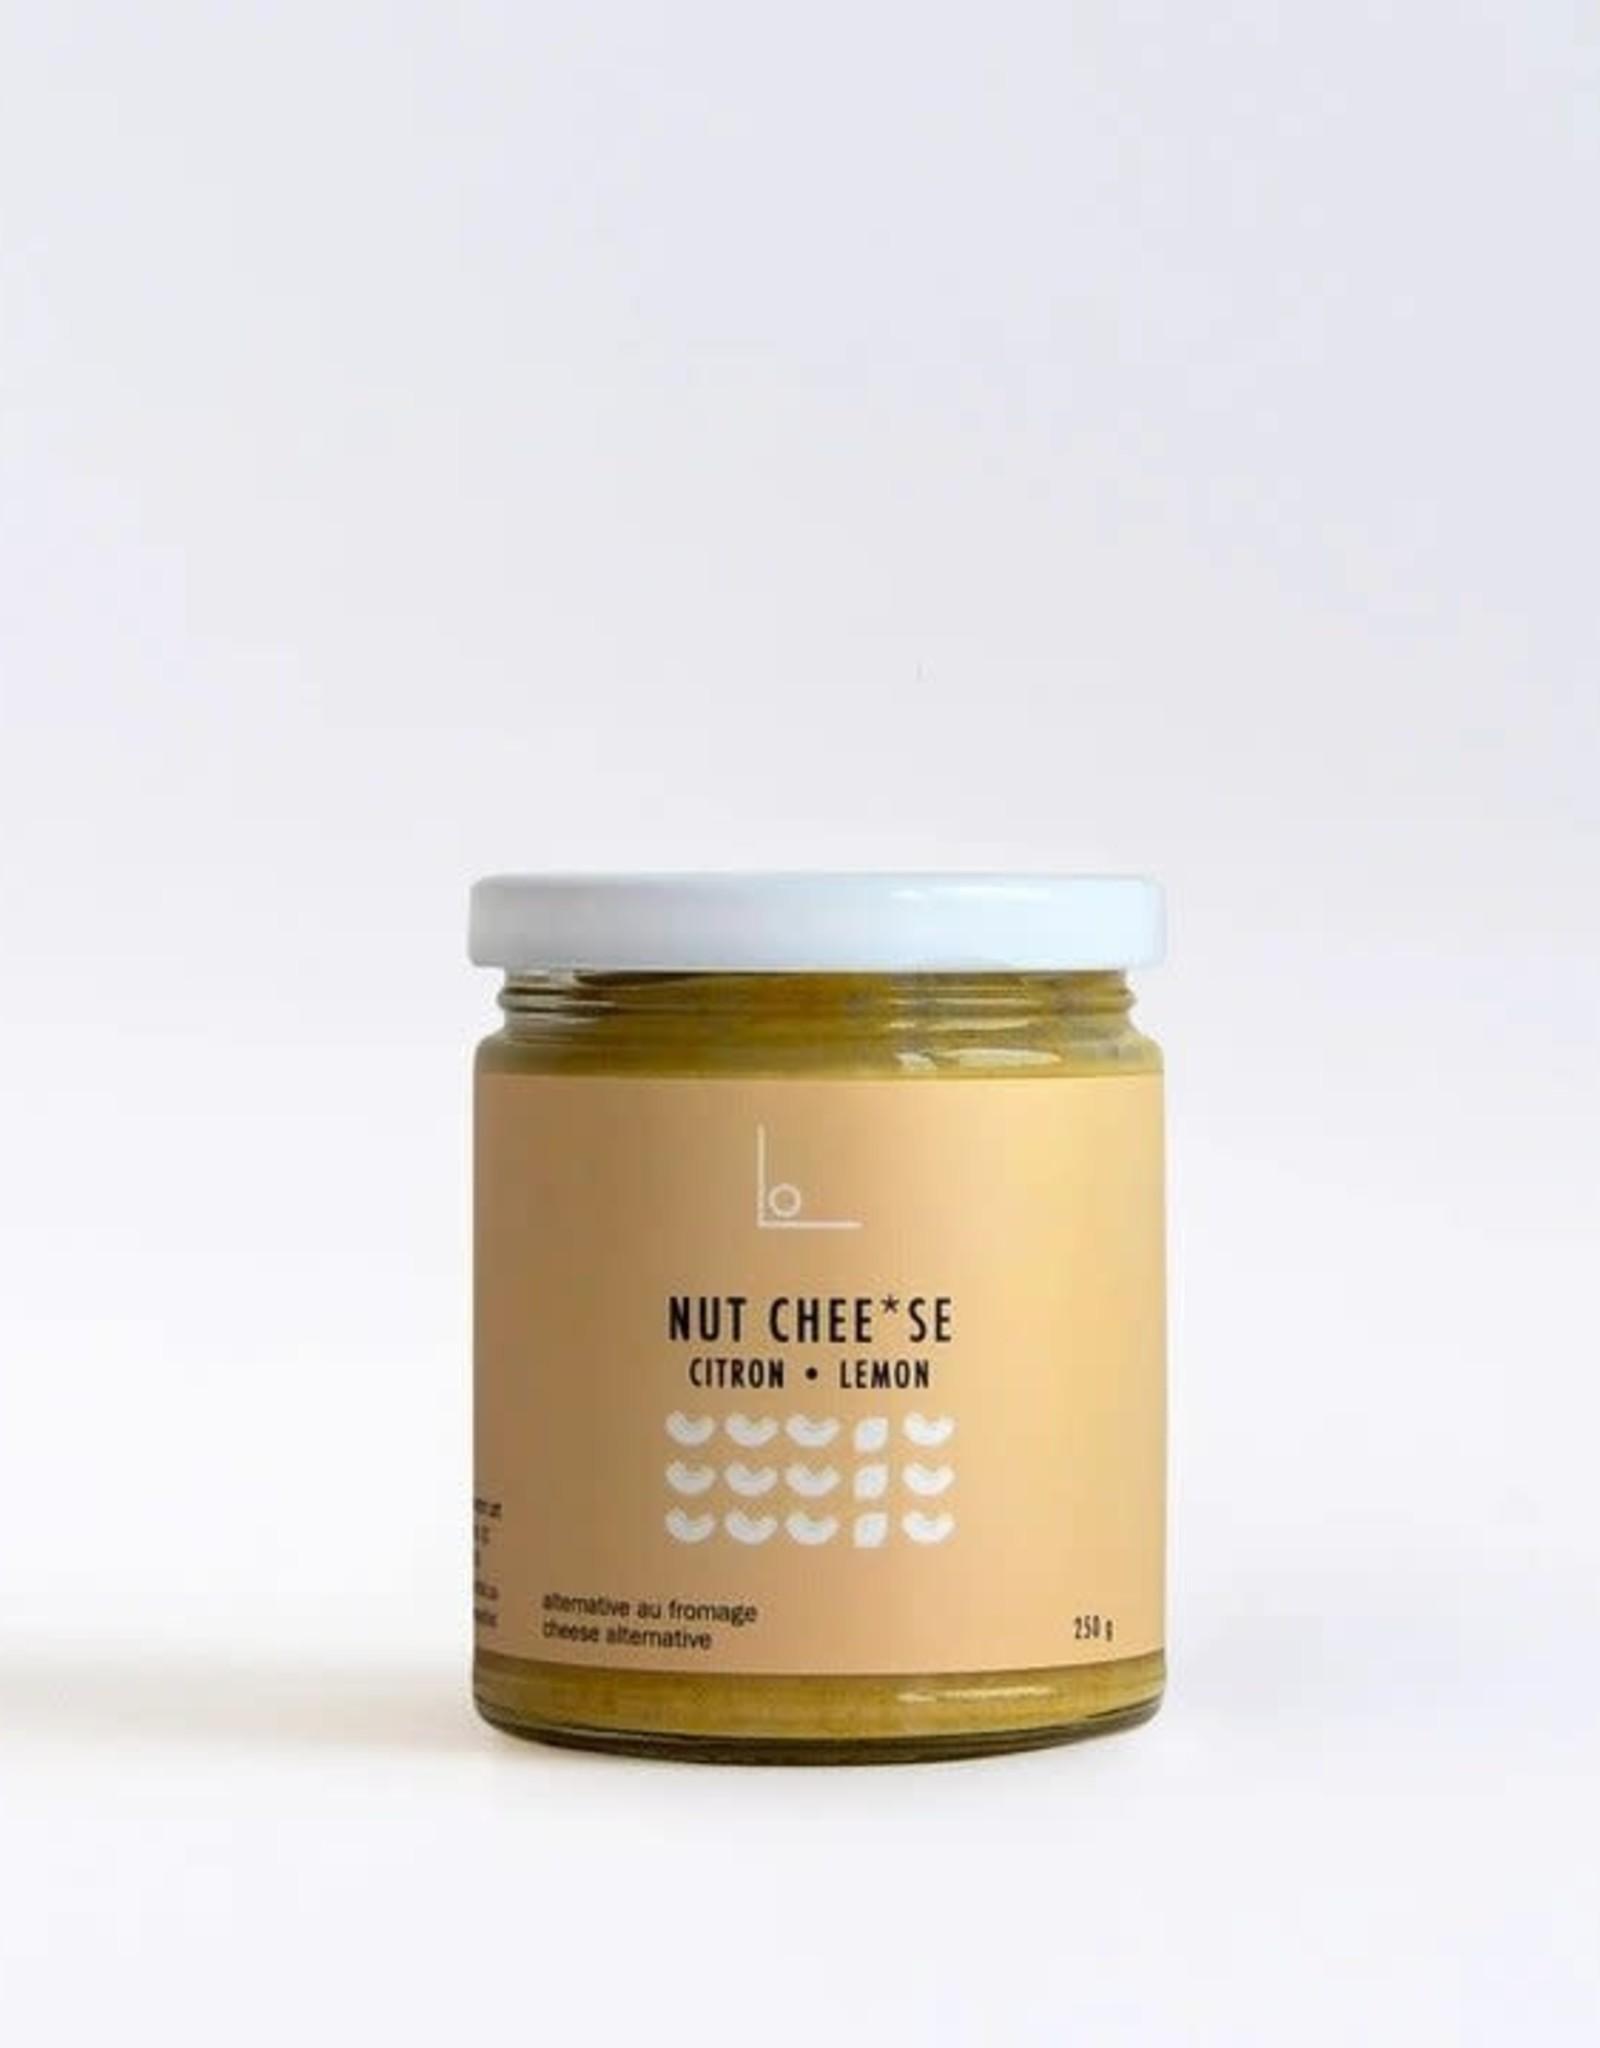 Logan Petit Lot Nut Chee*se Citron